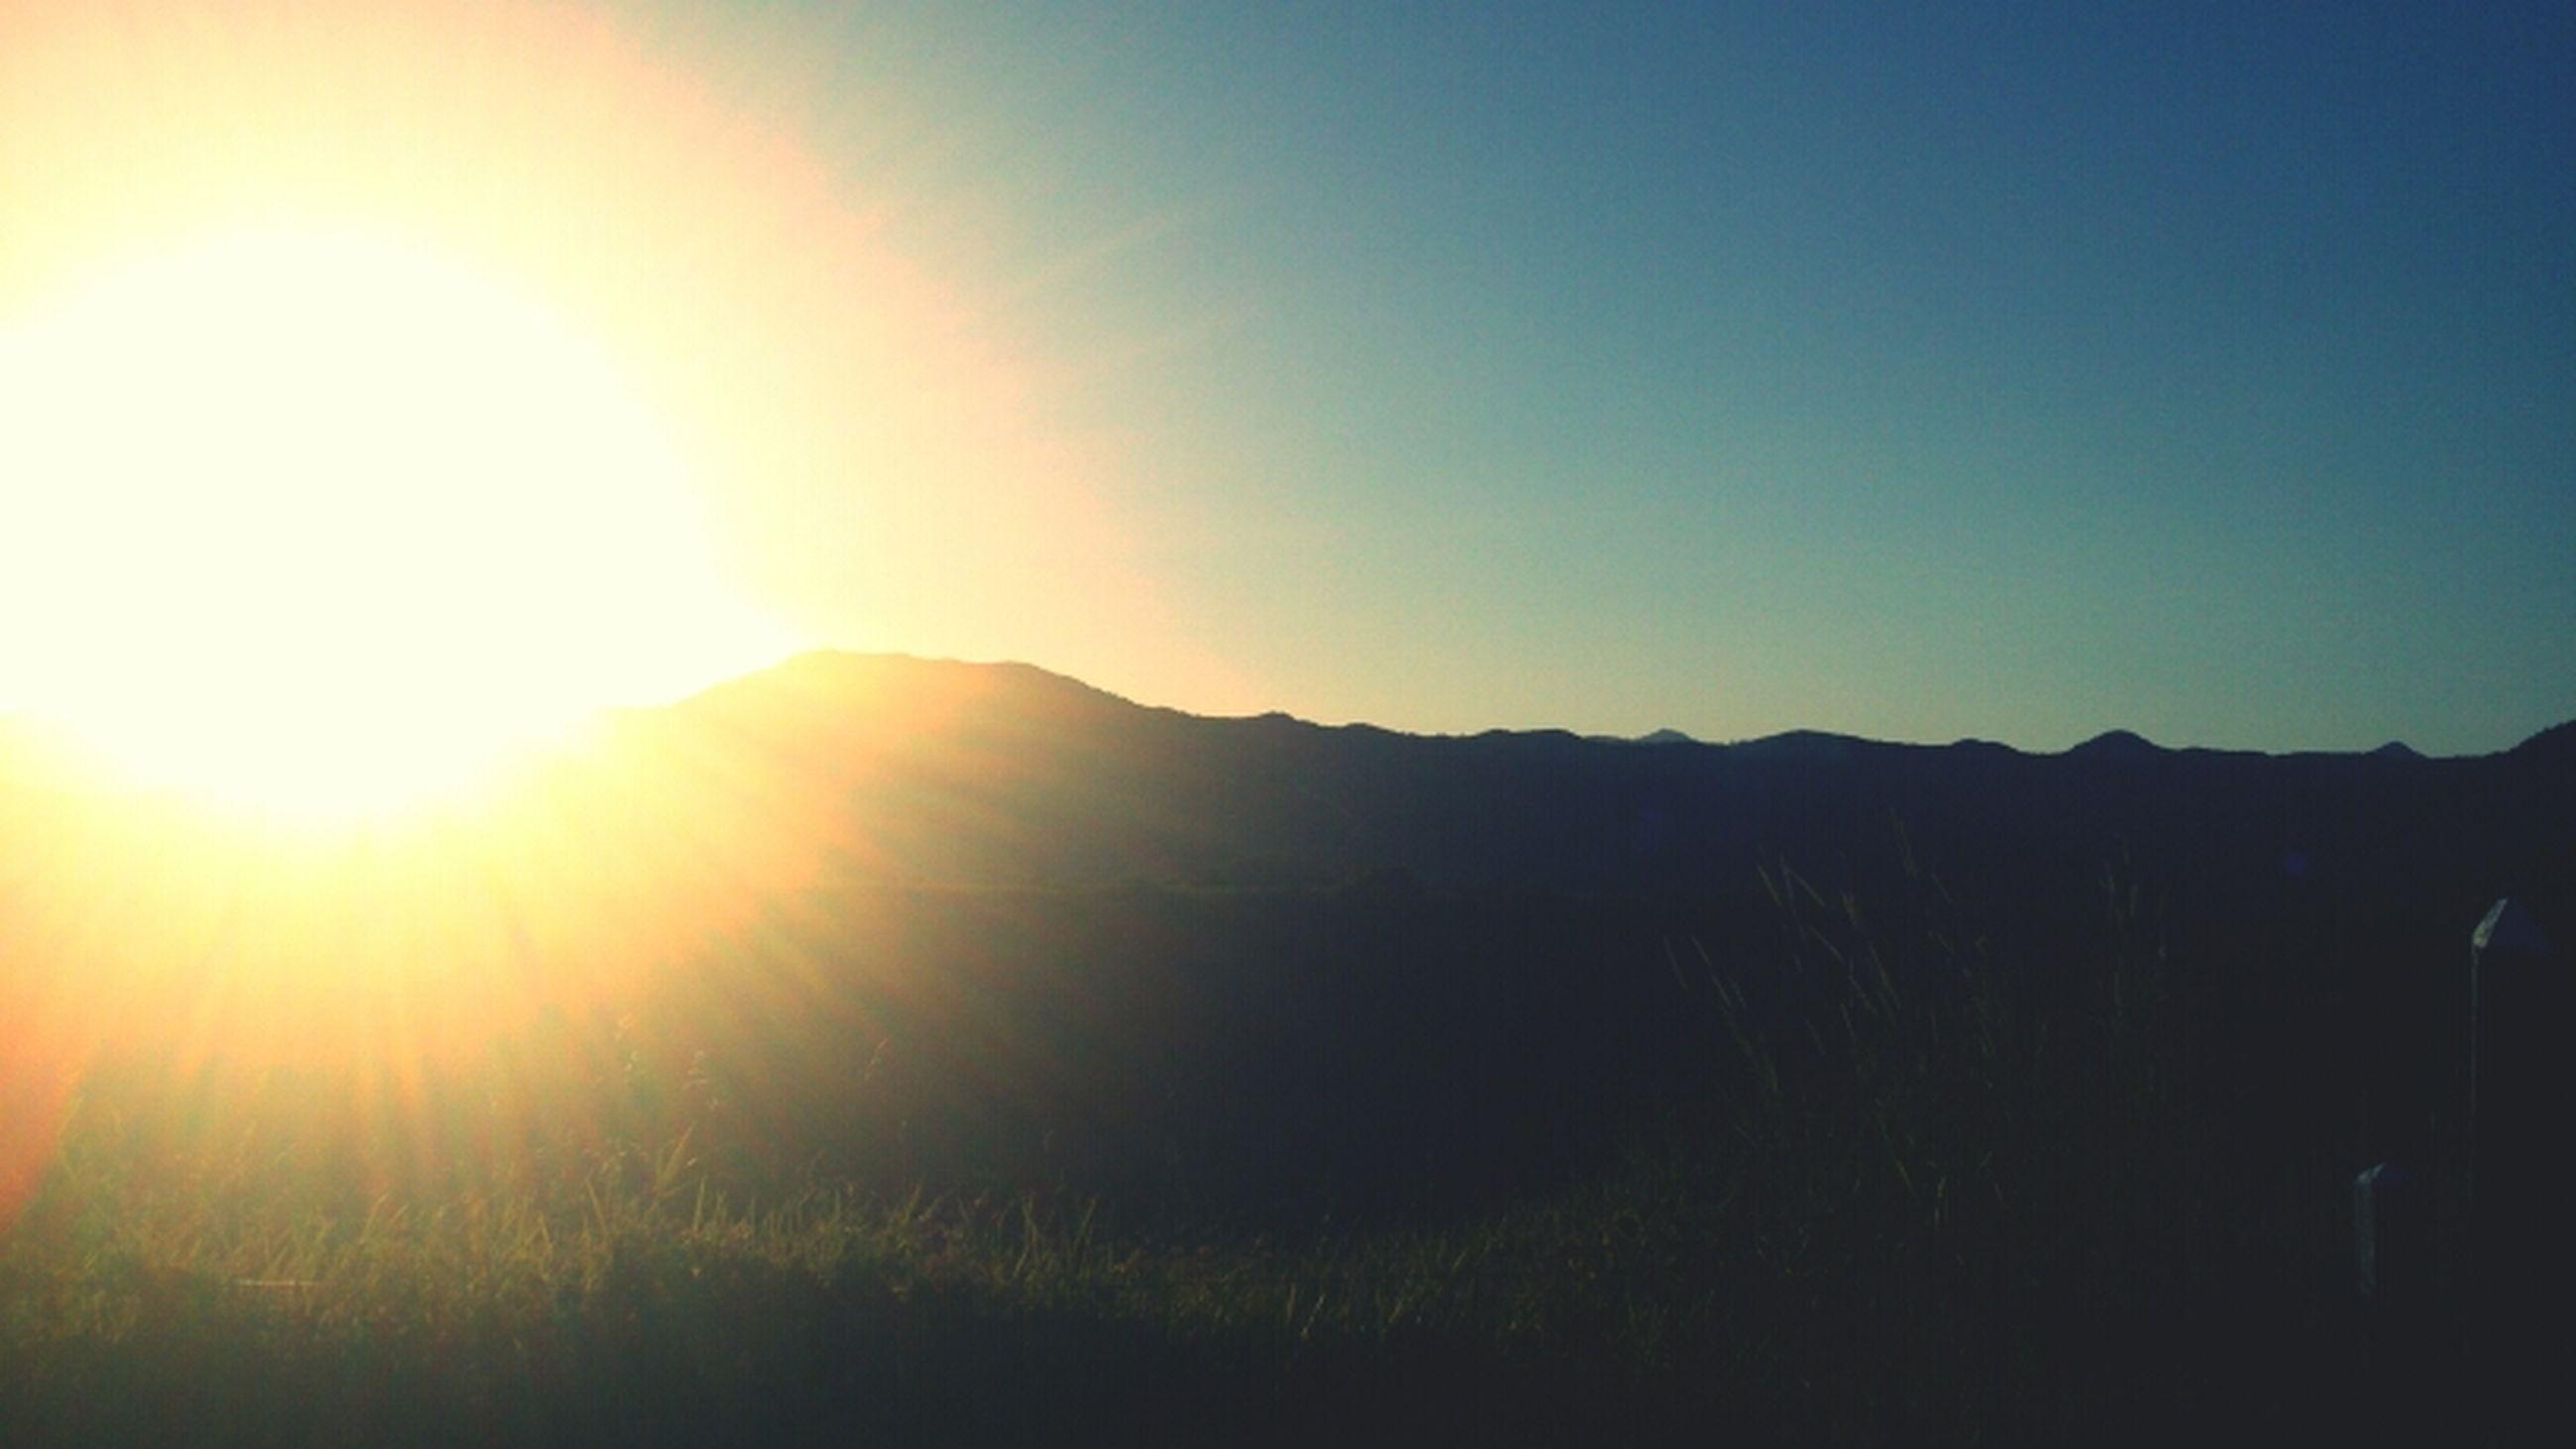 sun, sunbeam, lens flare, sunlight, tranquil scene, tranquility, landscape, scenics, clear sky, mountain, beauty in nature, sunset, copy space, nature, bright, idyllic, sky, mountain range, non-urban scene, field